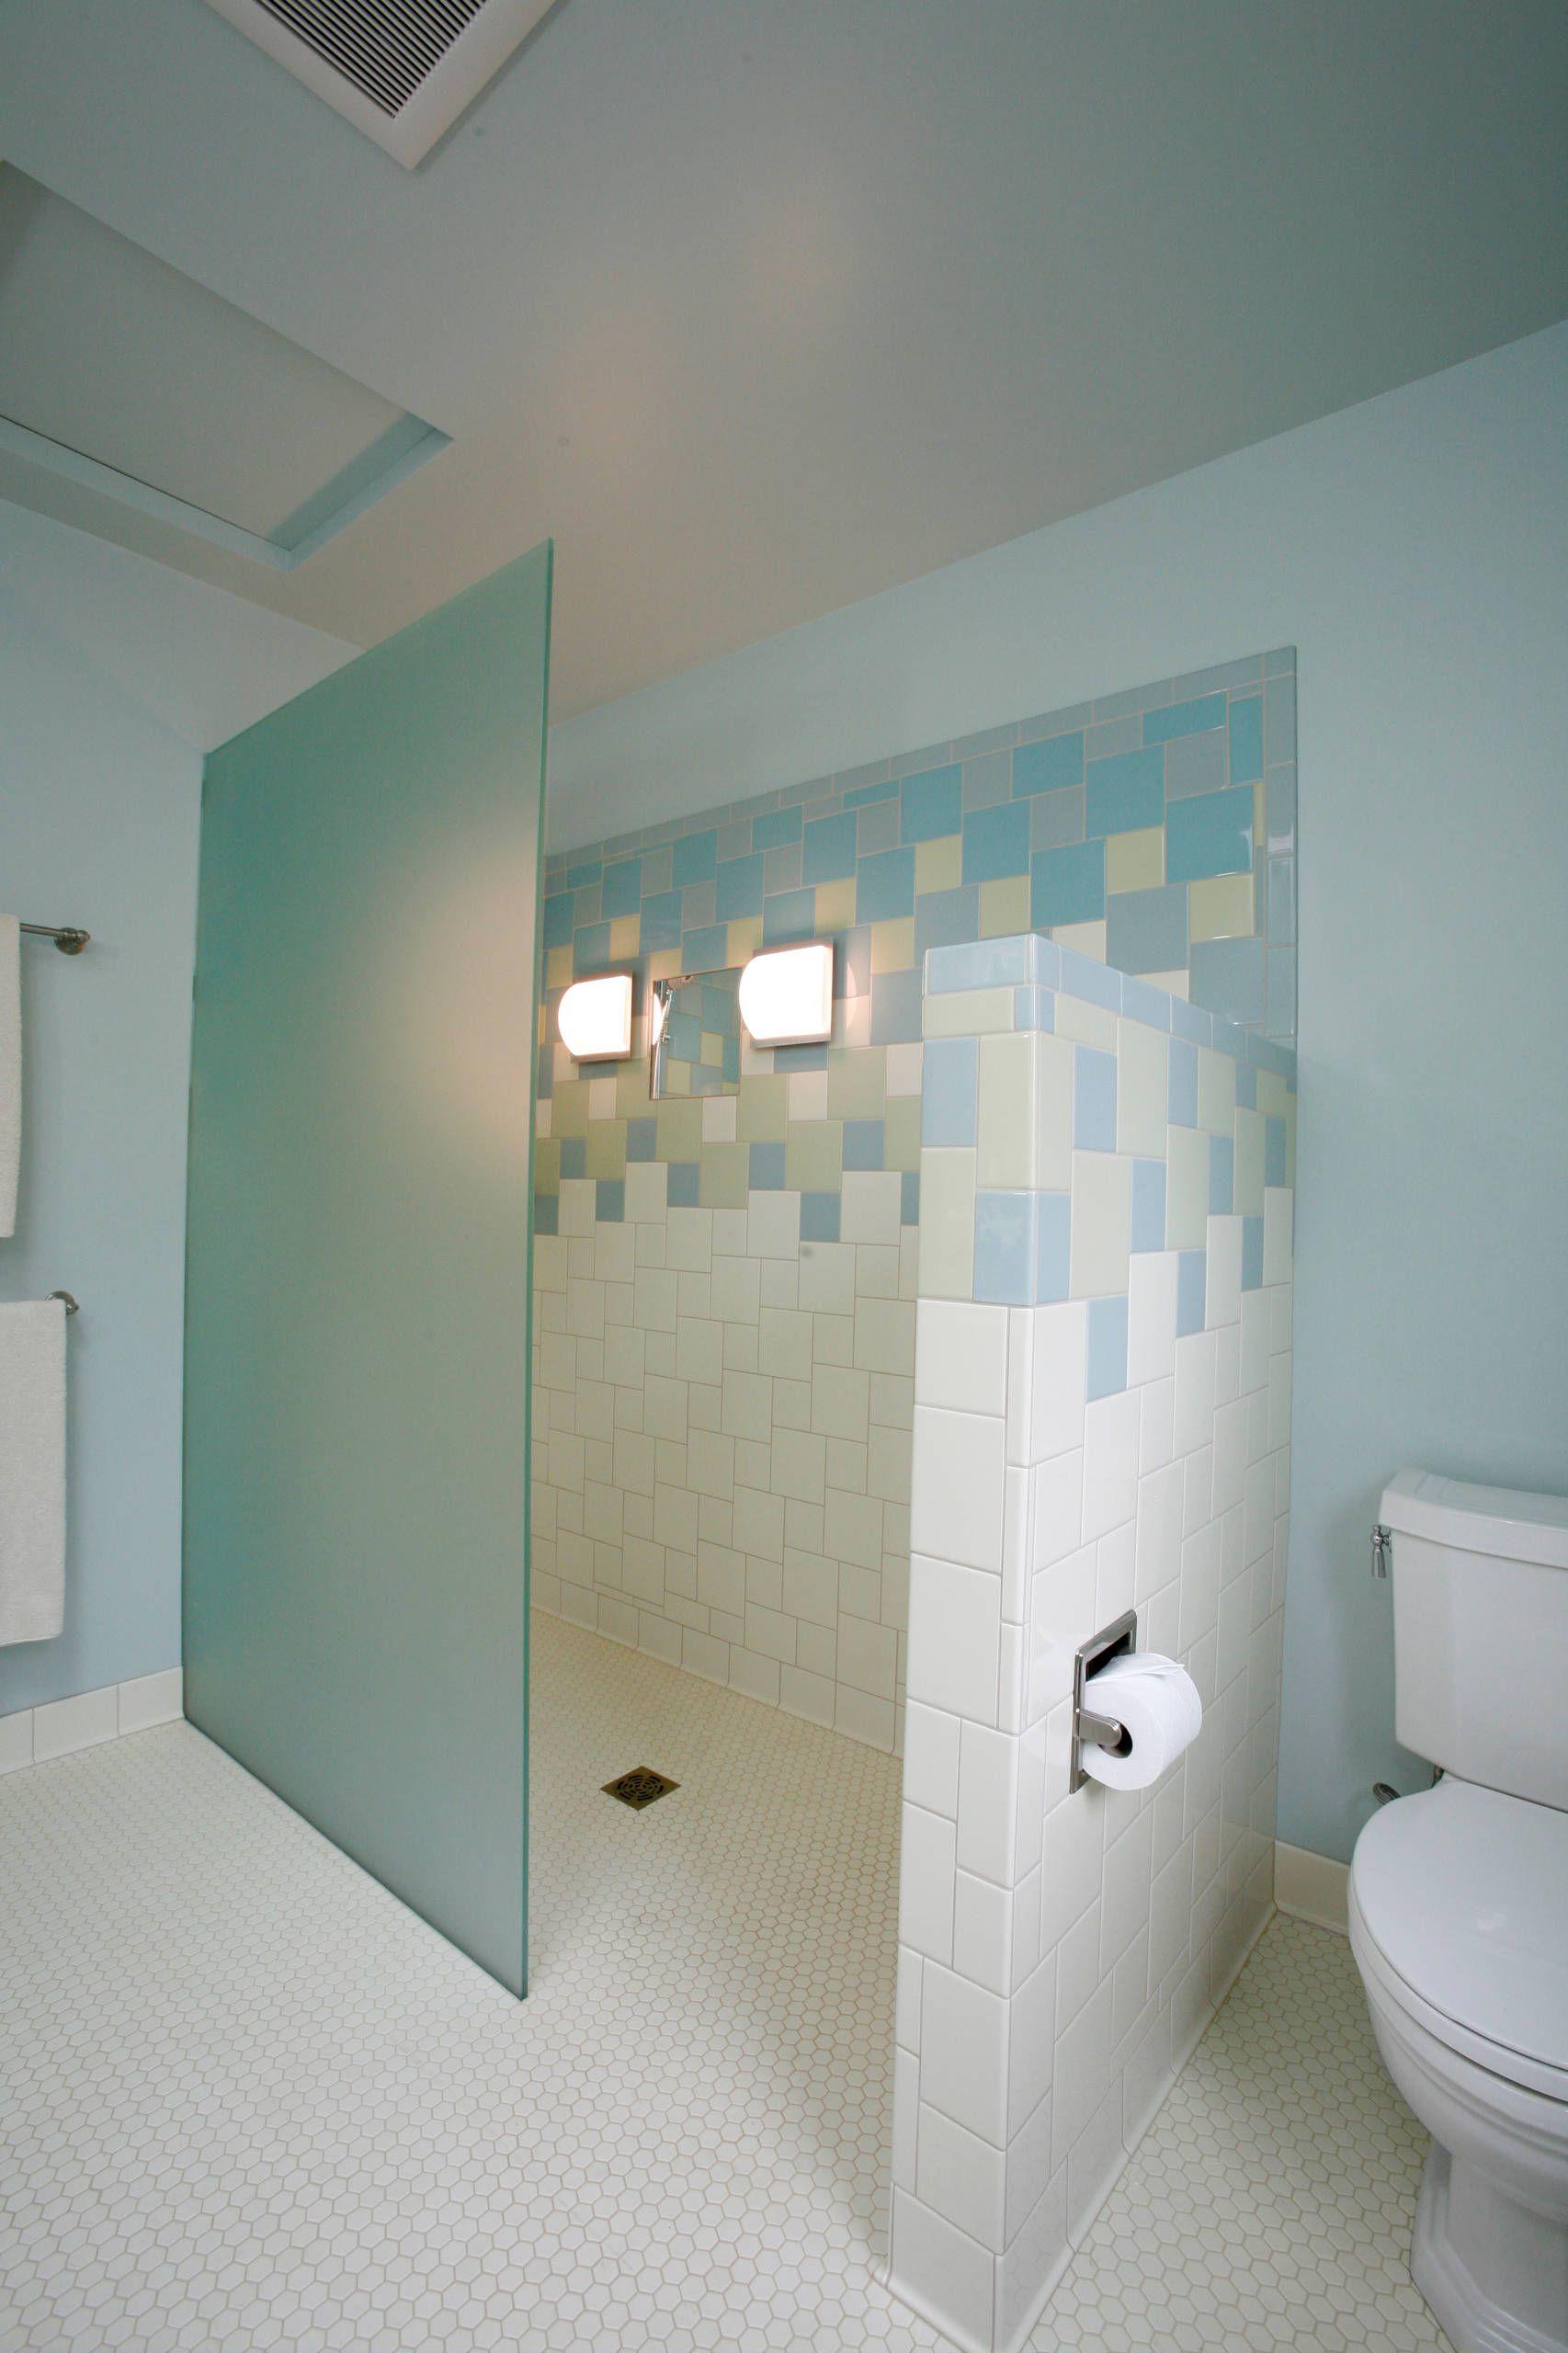 Brilliant Bathroom Ideas Using Doorless Shower Designs Shower Tile Ideas For Doorless Shower Designs Wi Doorless Shower Design Doorless Shower Bathroom Design